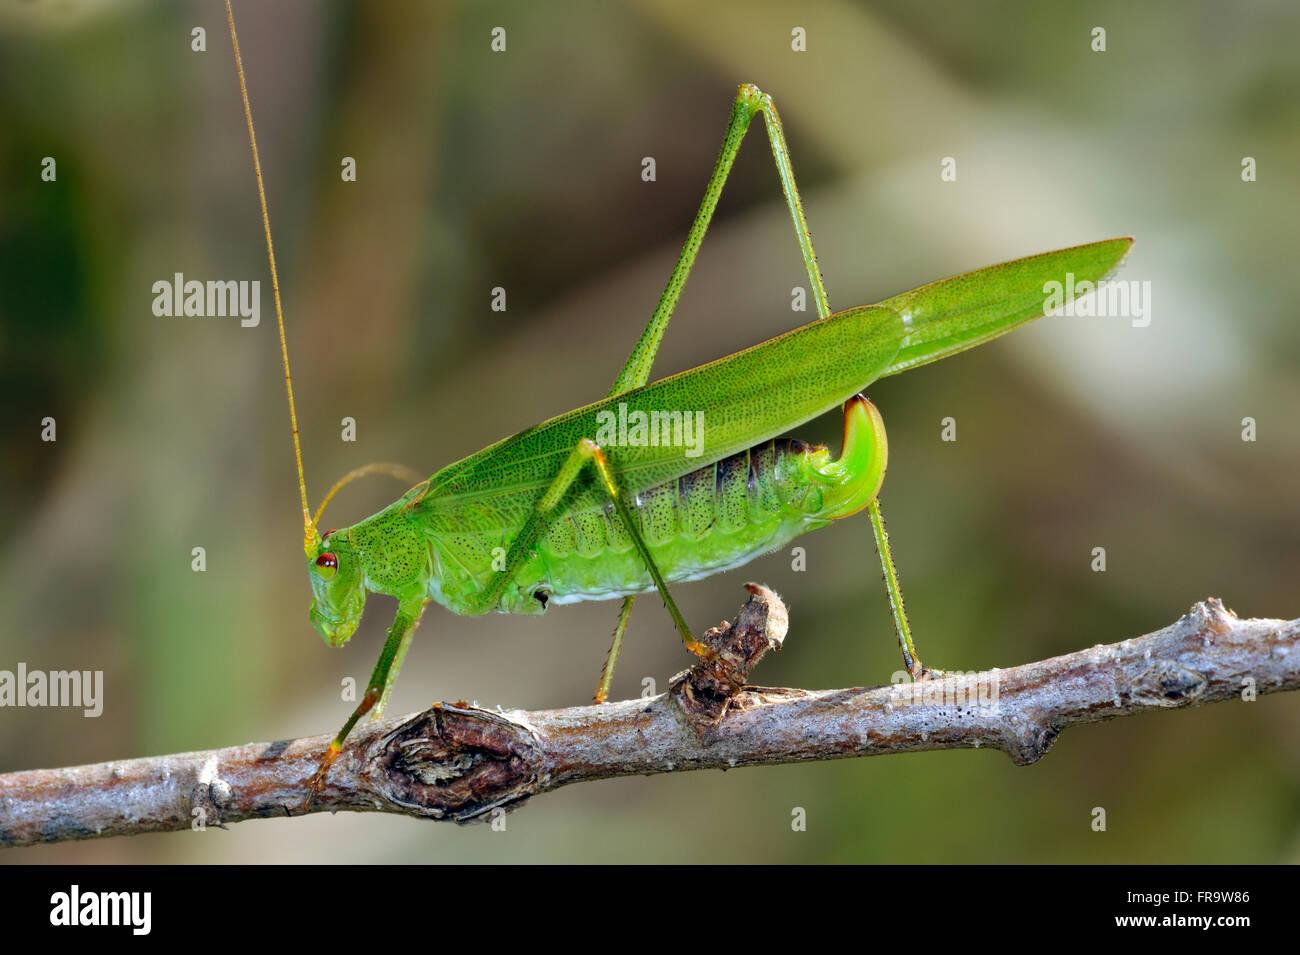 Southern sickle-bearing bush cricket (Phaneroptera nana / Phaneroptera quadripunctata) female on twig - Stock Image